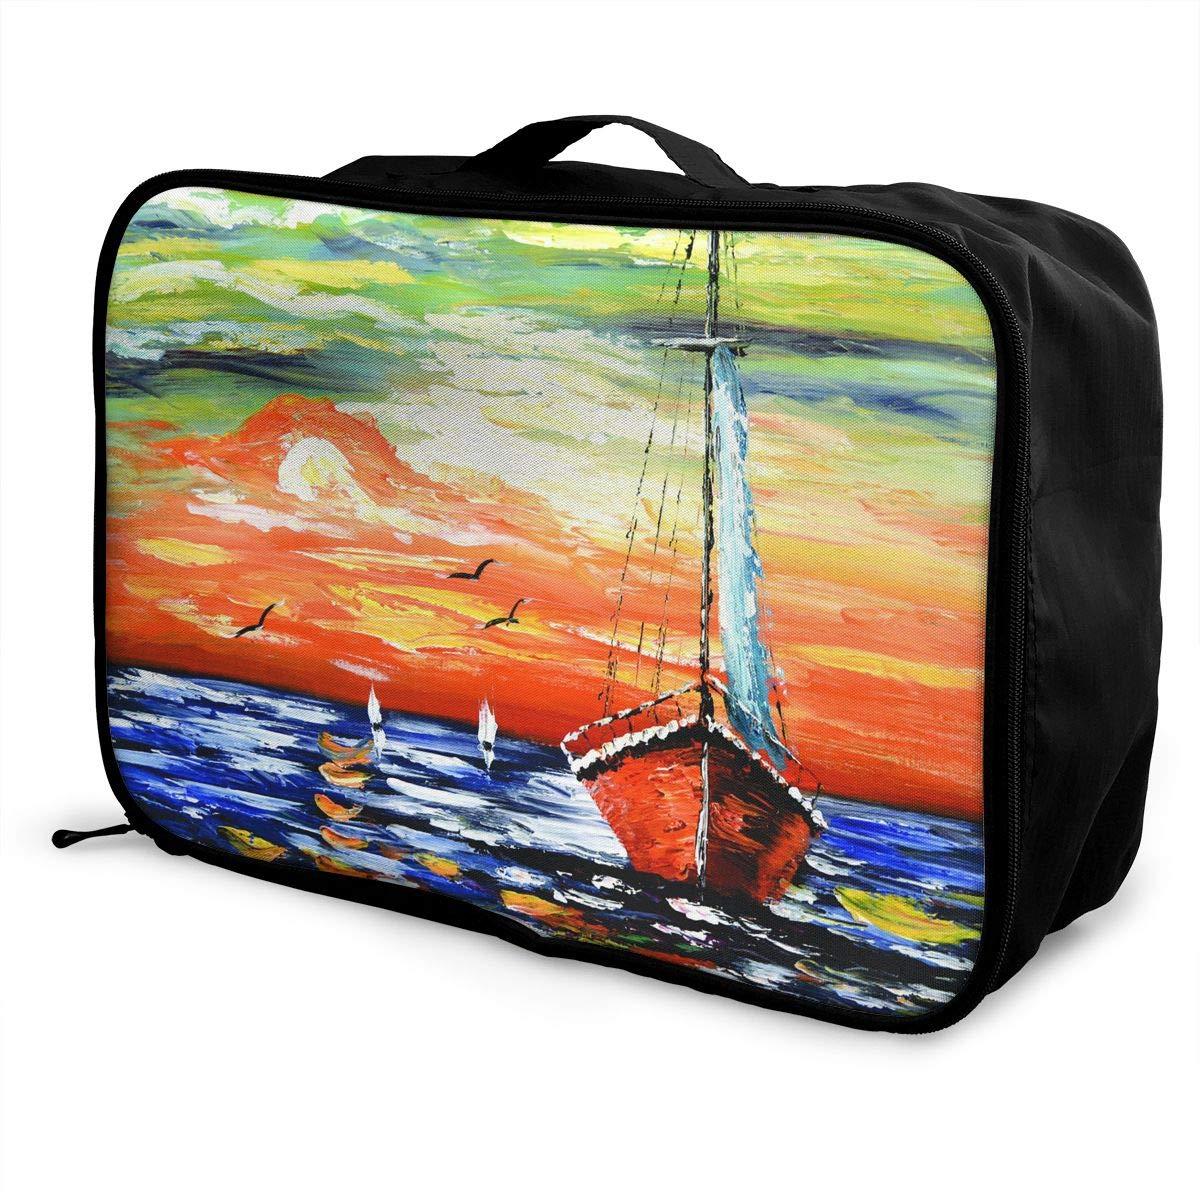 Travel Luggage Duffle Bag Lightweight Portable Handbag Sea Sailboat Large Capacity Waterproof Foldable Storage Tote